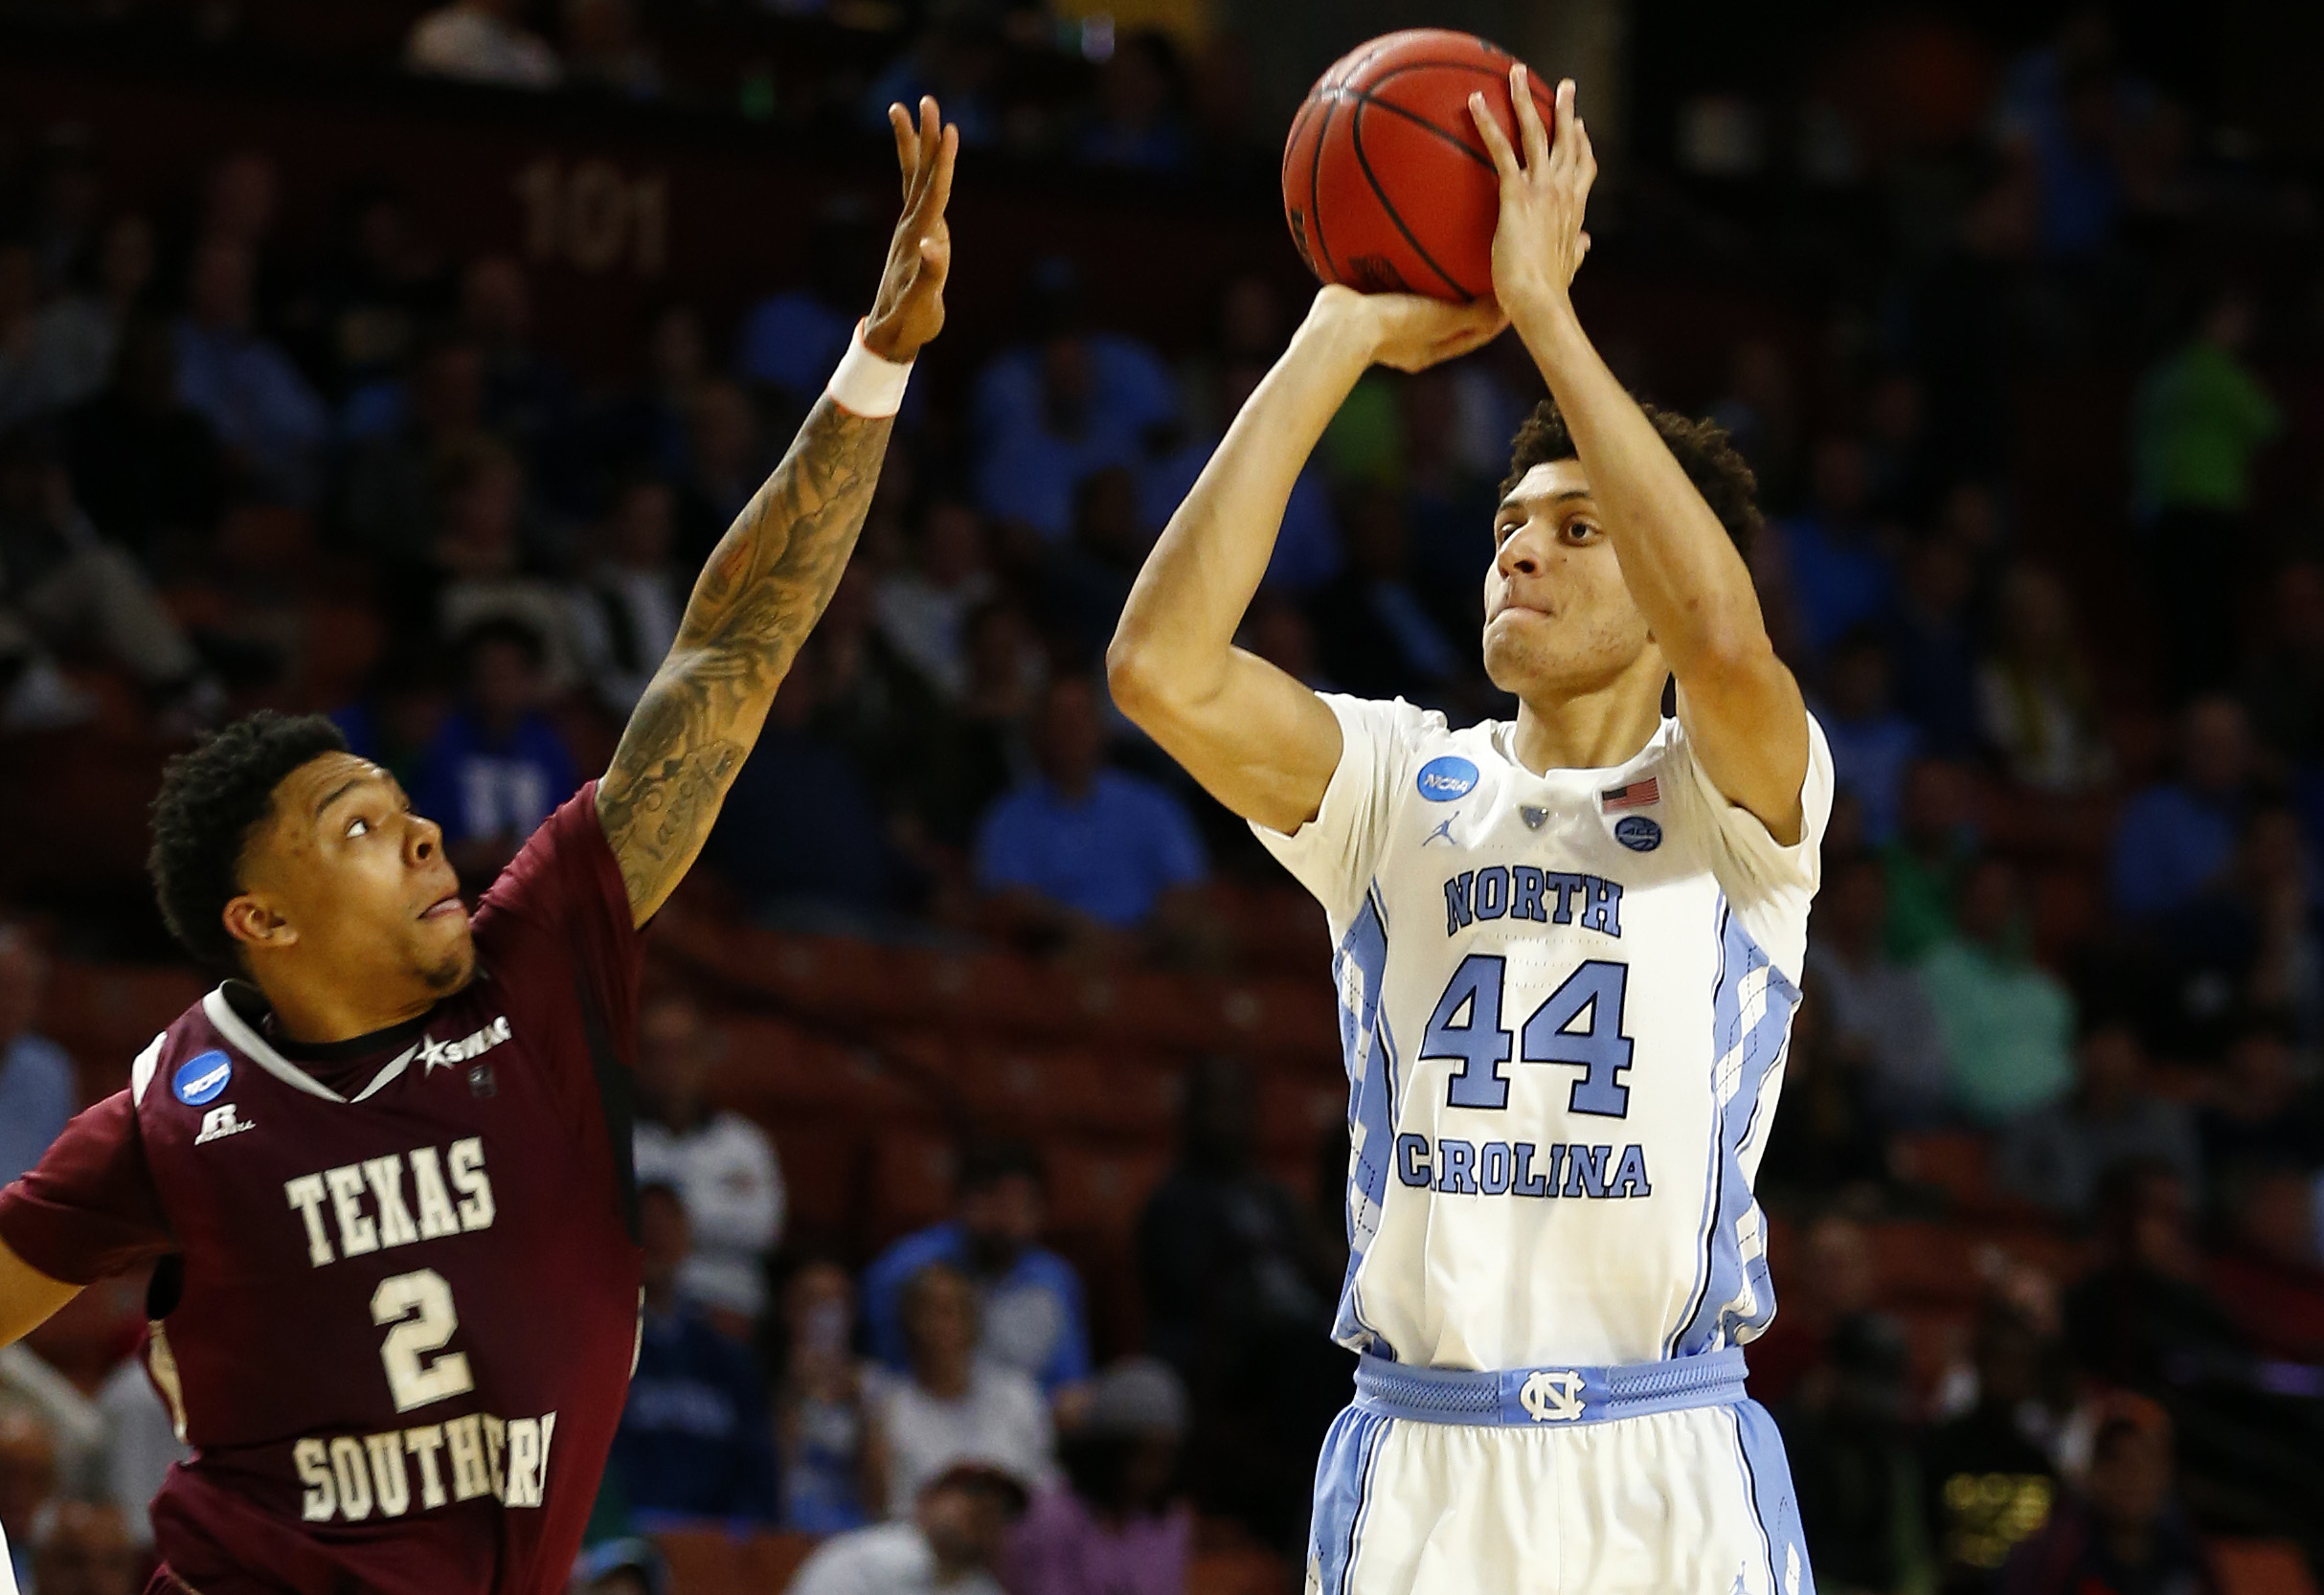 9950717-ncaa-basketball-ncaa-tournament-first-round-north-carolina-vs-texas-southern-1